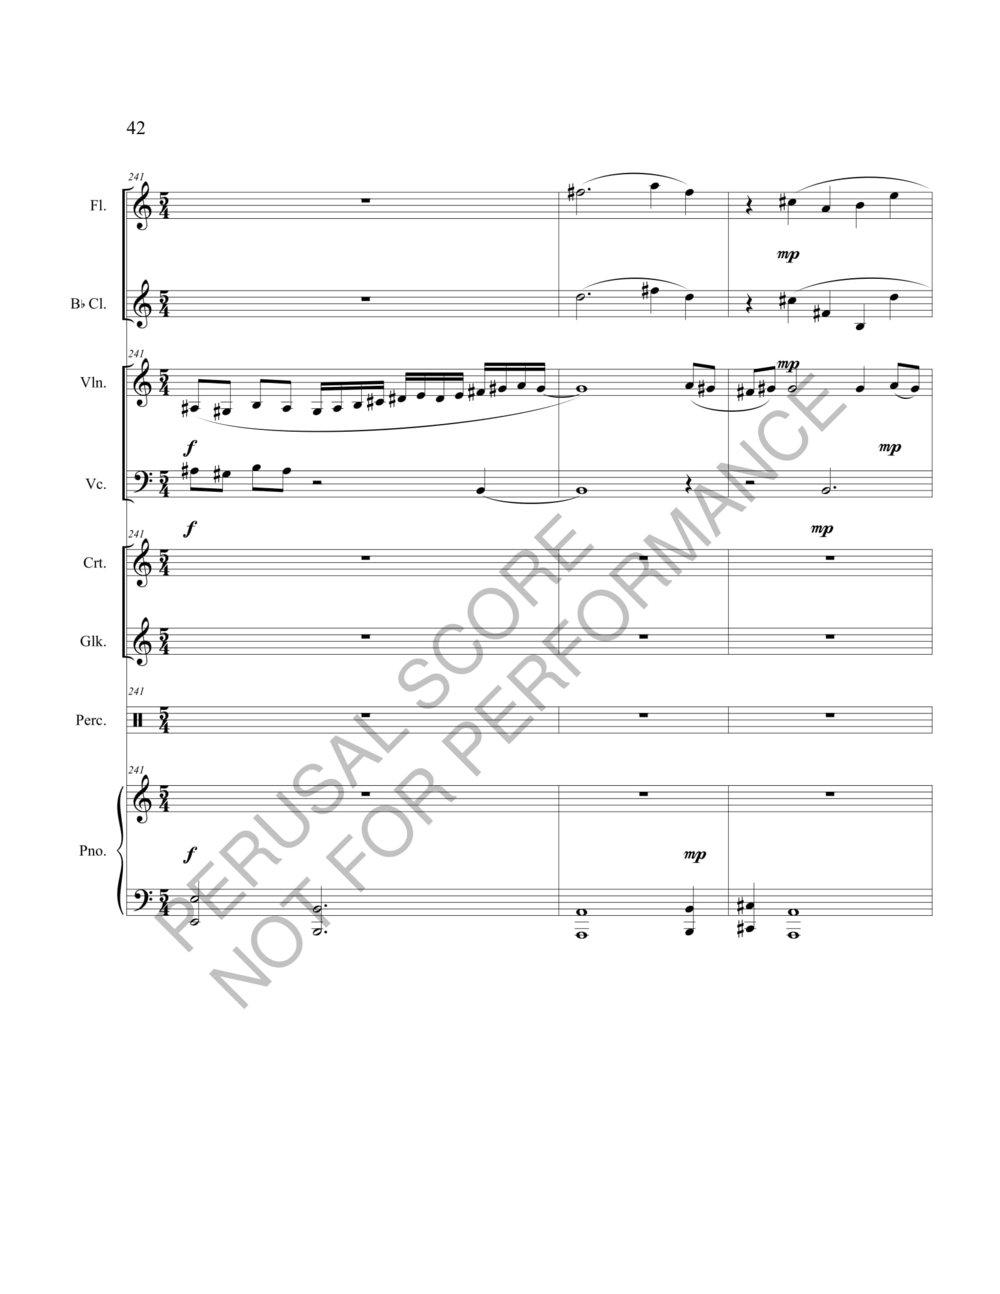 Boyd Terra Liberi Score-watermark-48.jpg